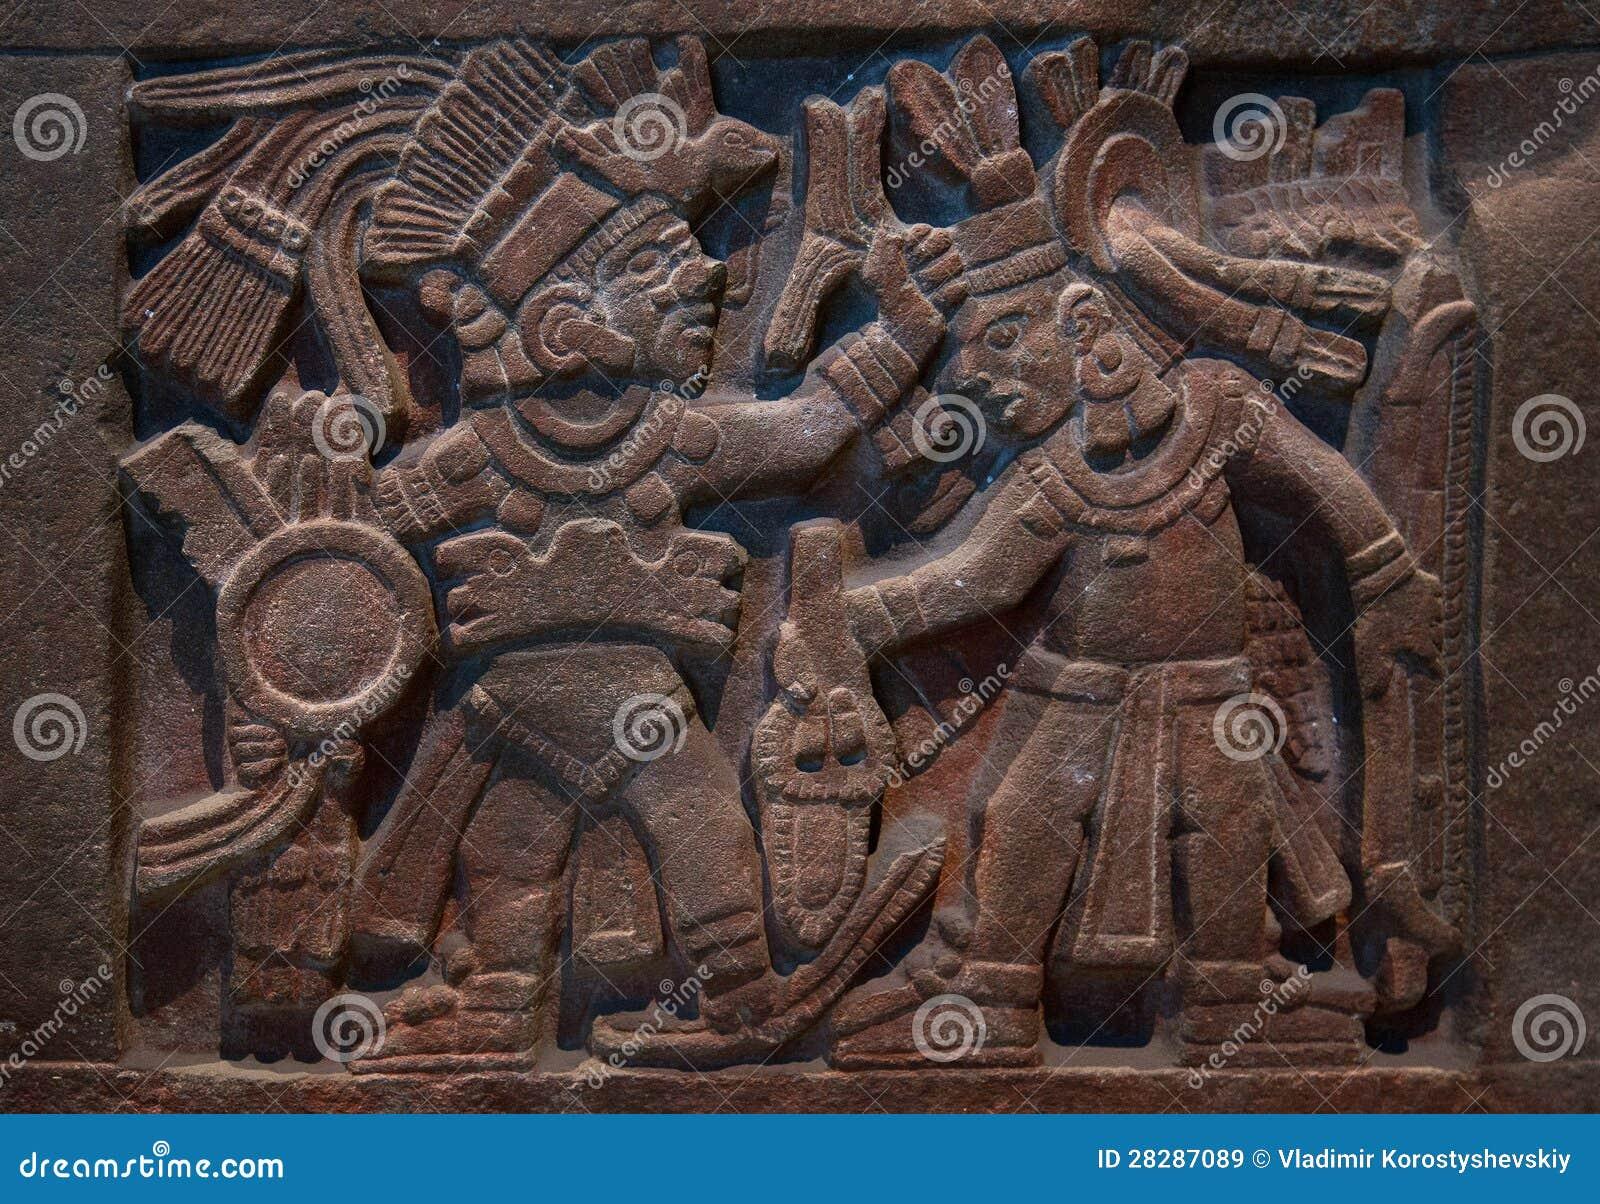 Ancient mayan stone carving royalty free stock photo